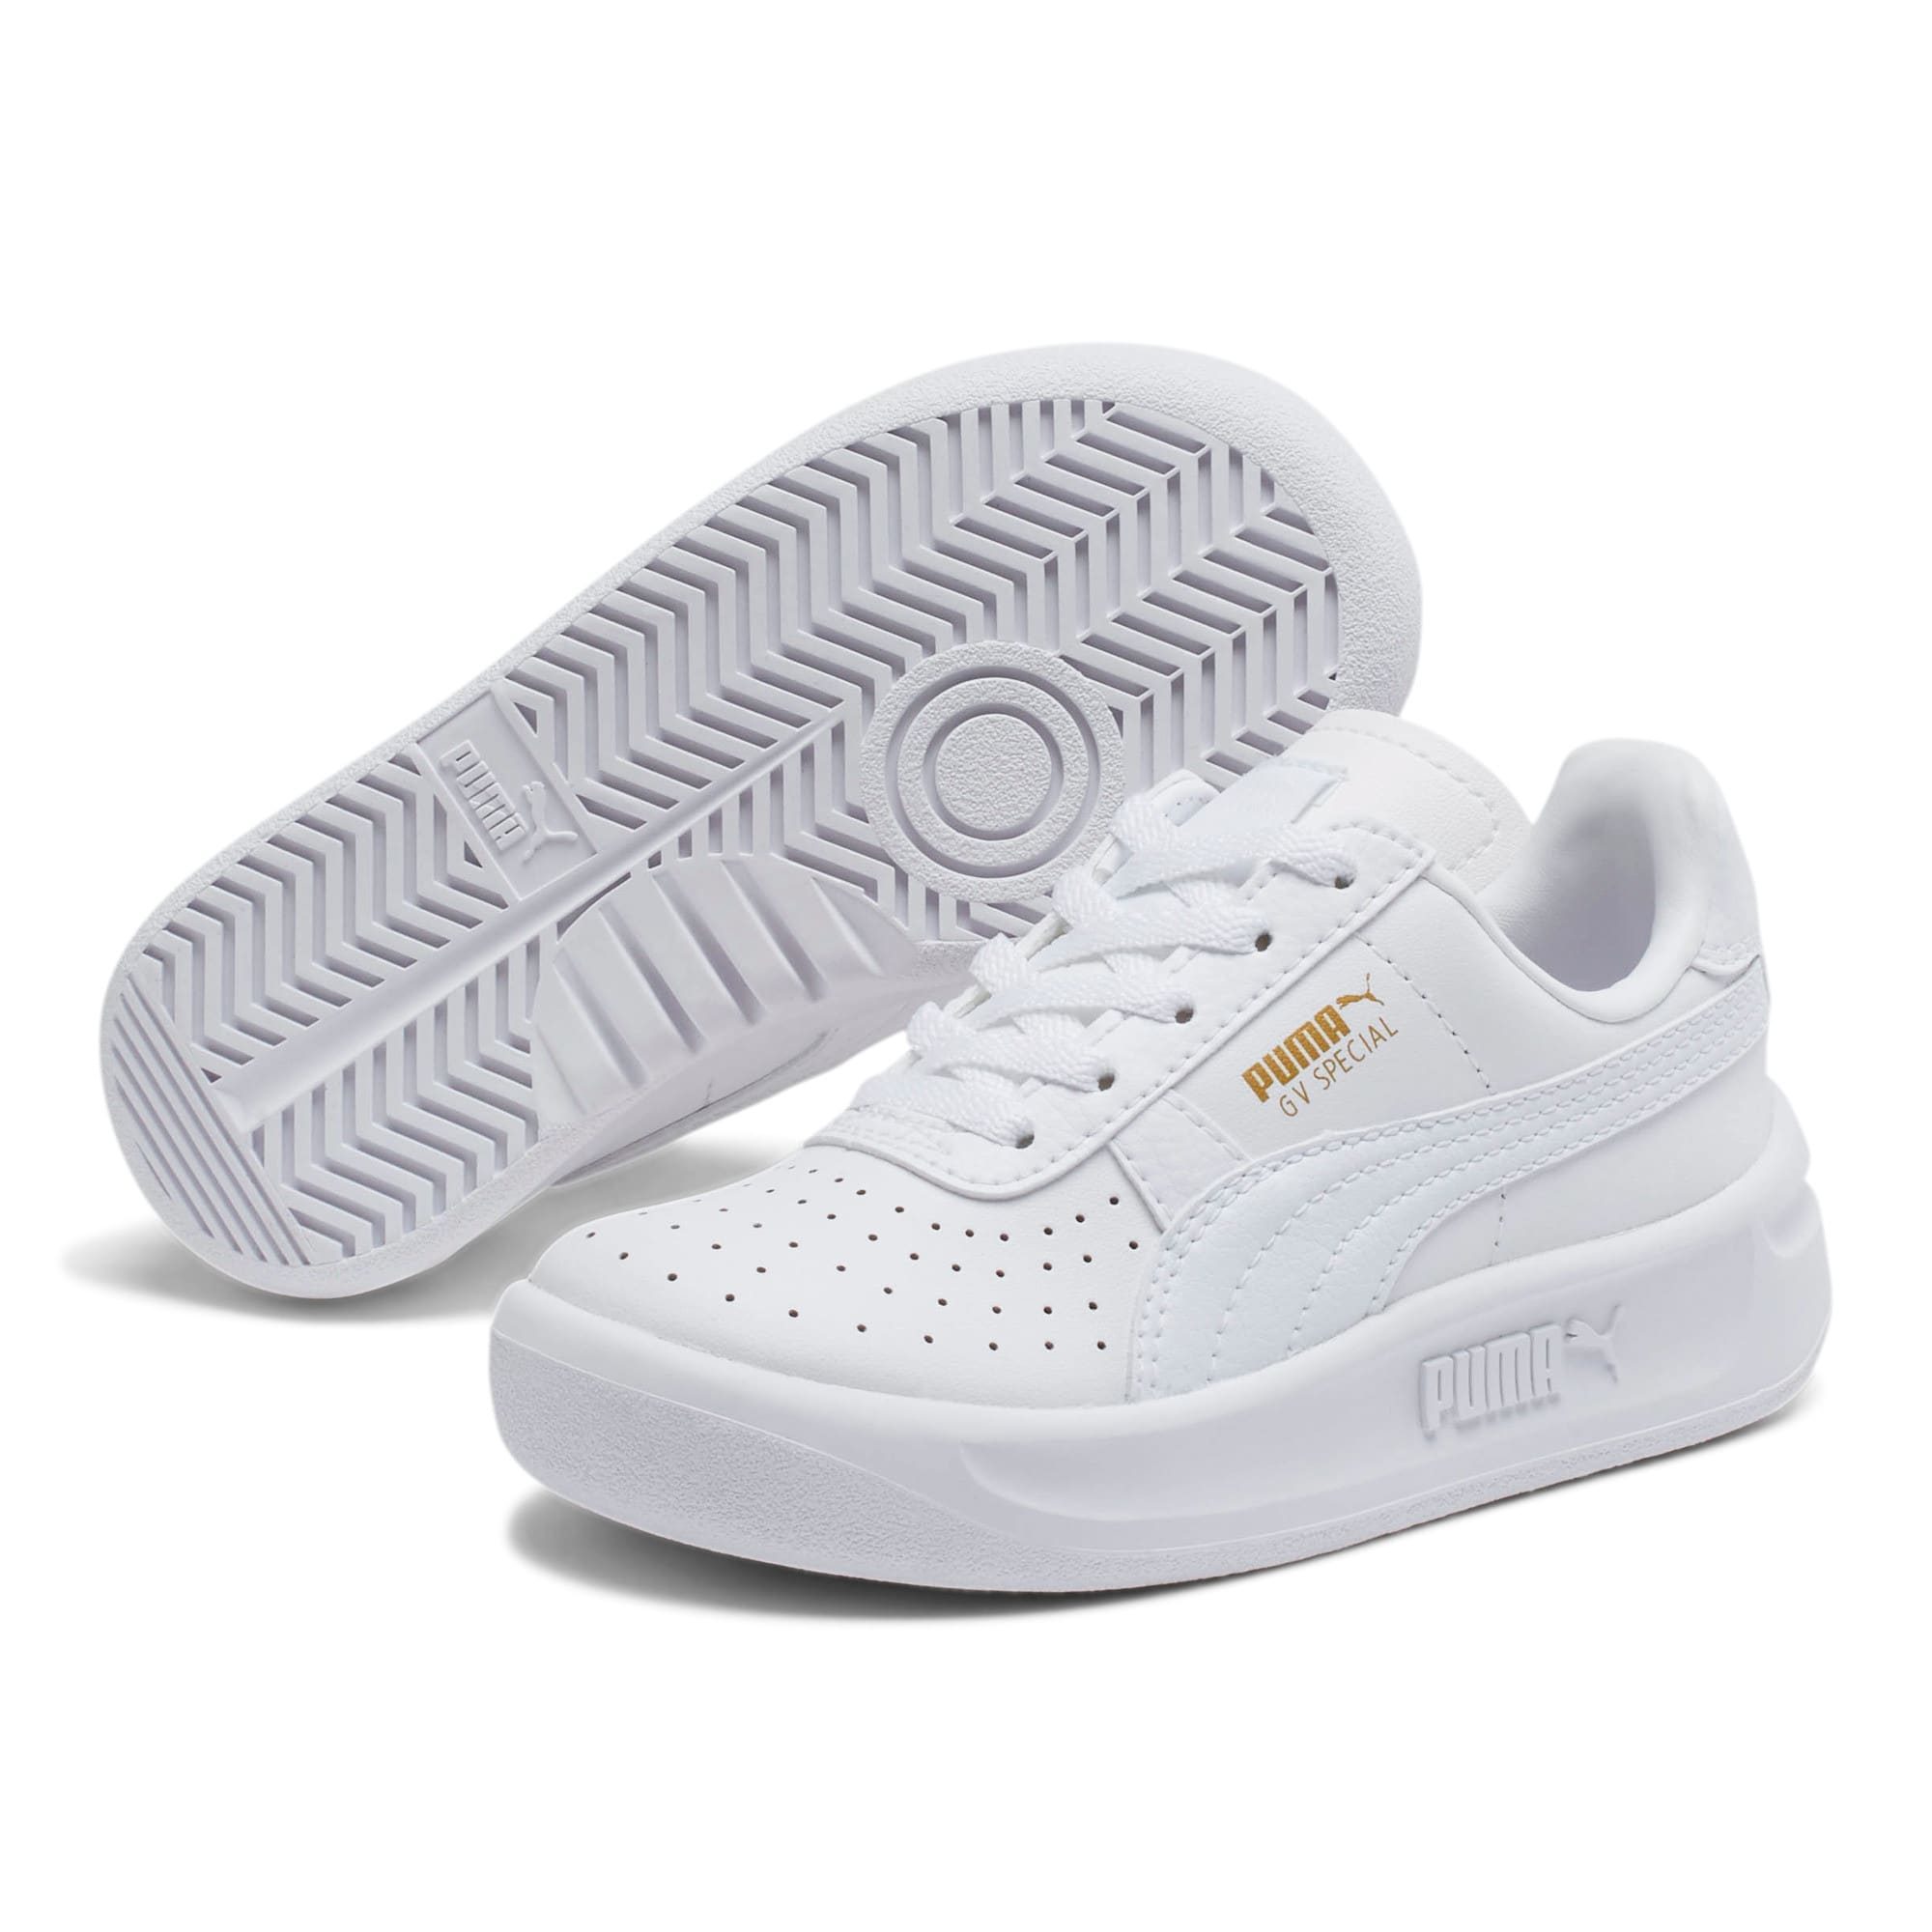 Thumbnail 2 of GV Special Little Kids' Shoes, Puma White-Puma Team Gold, medium